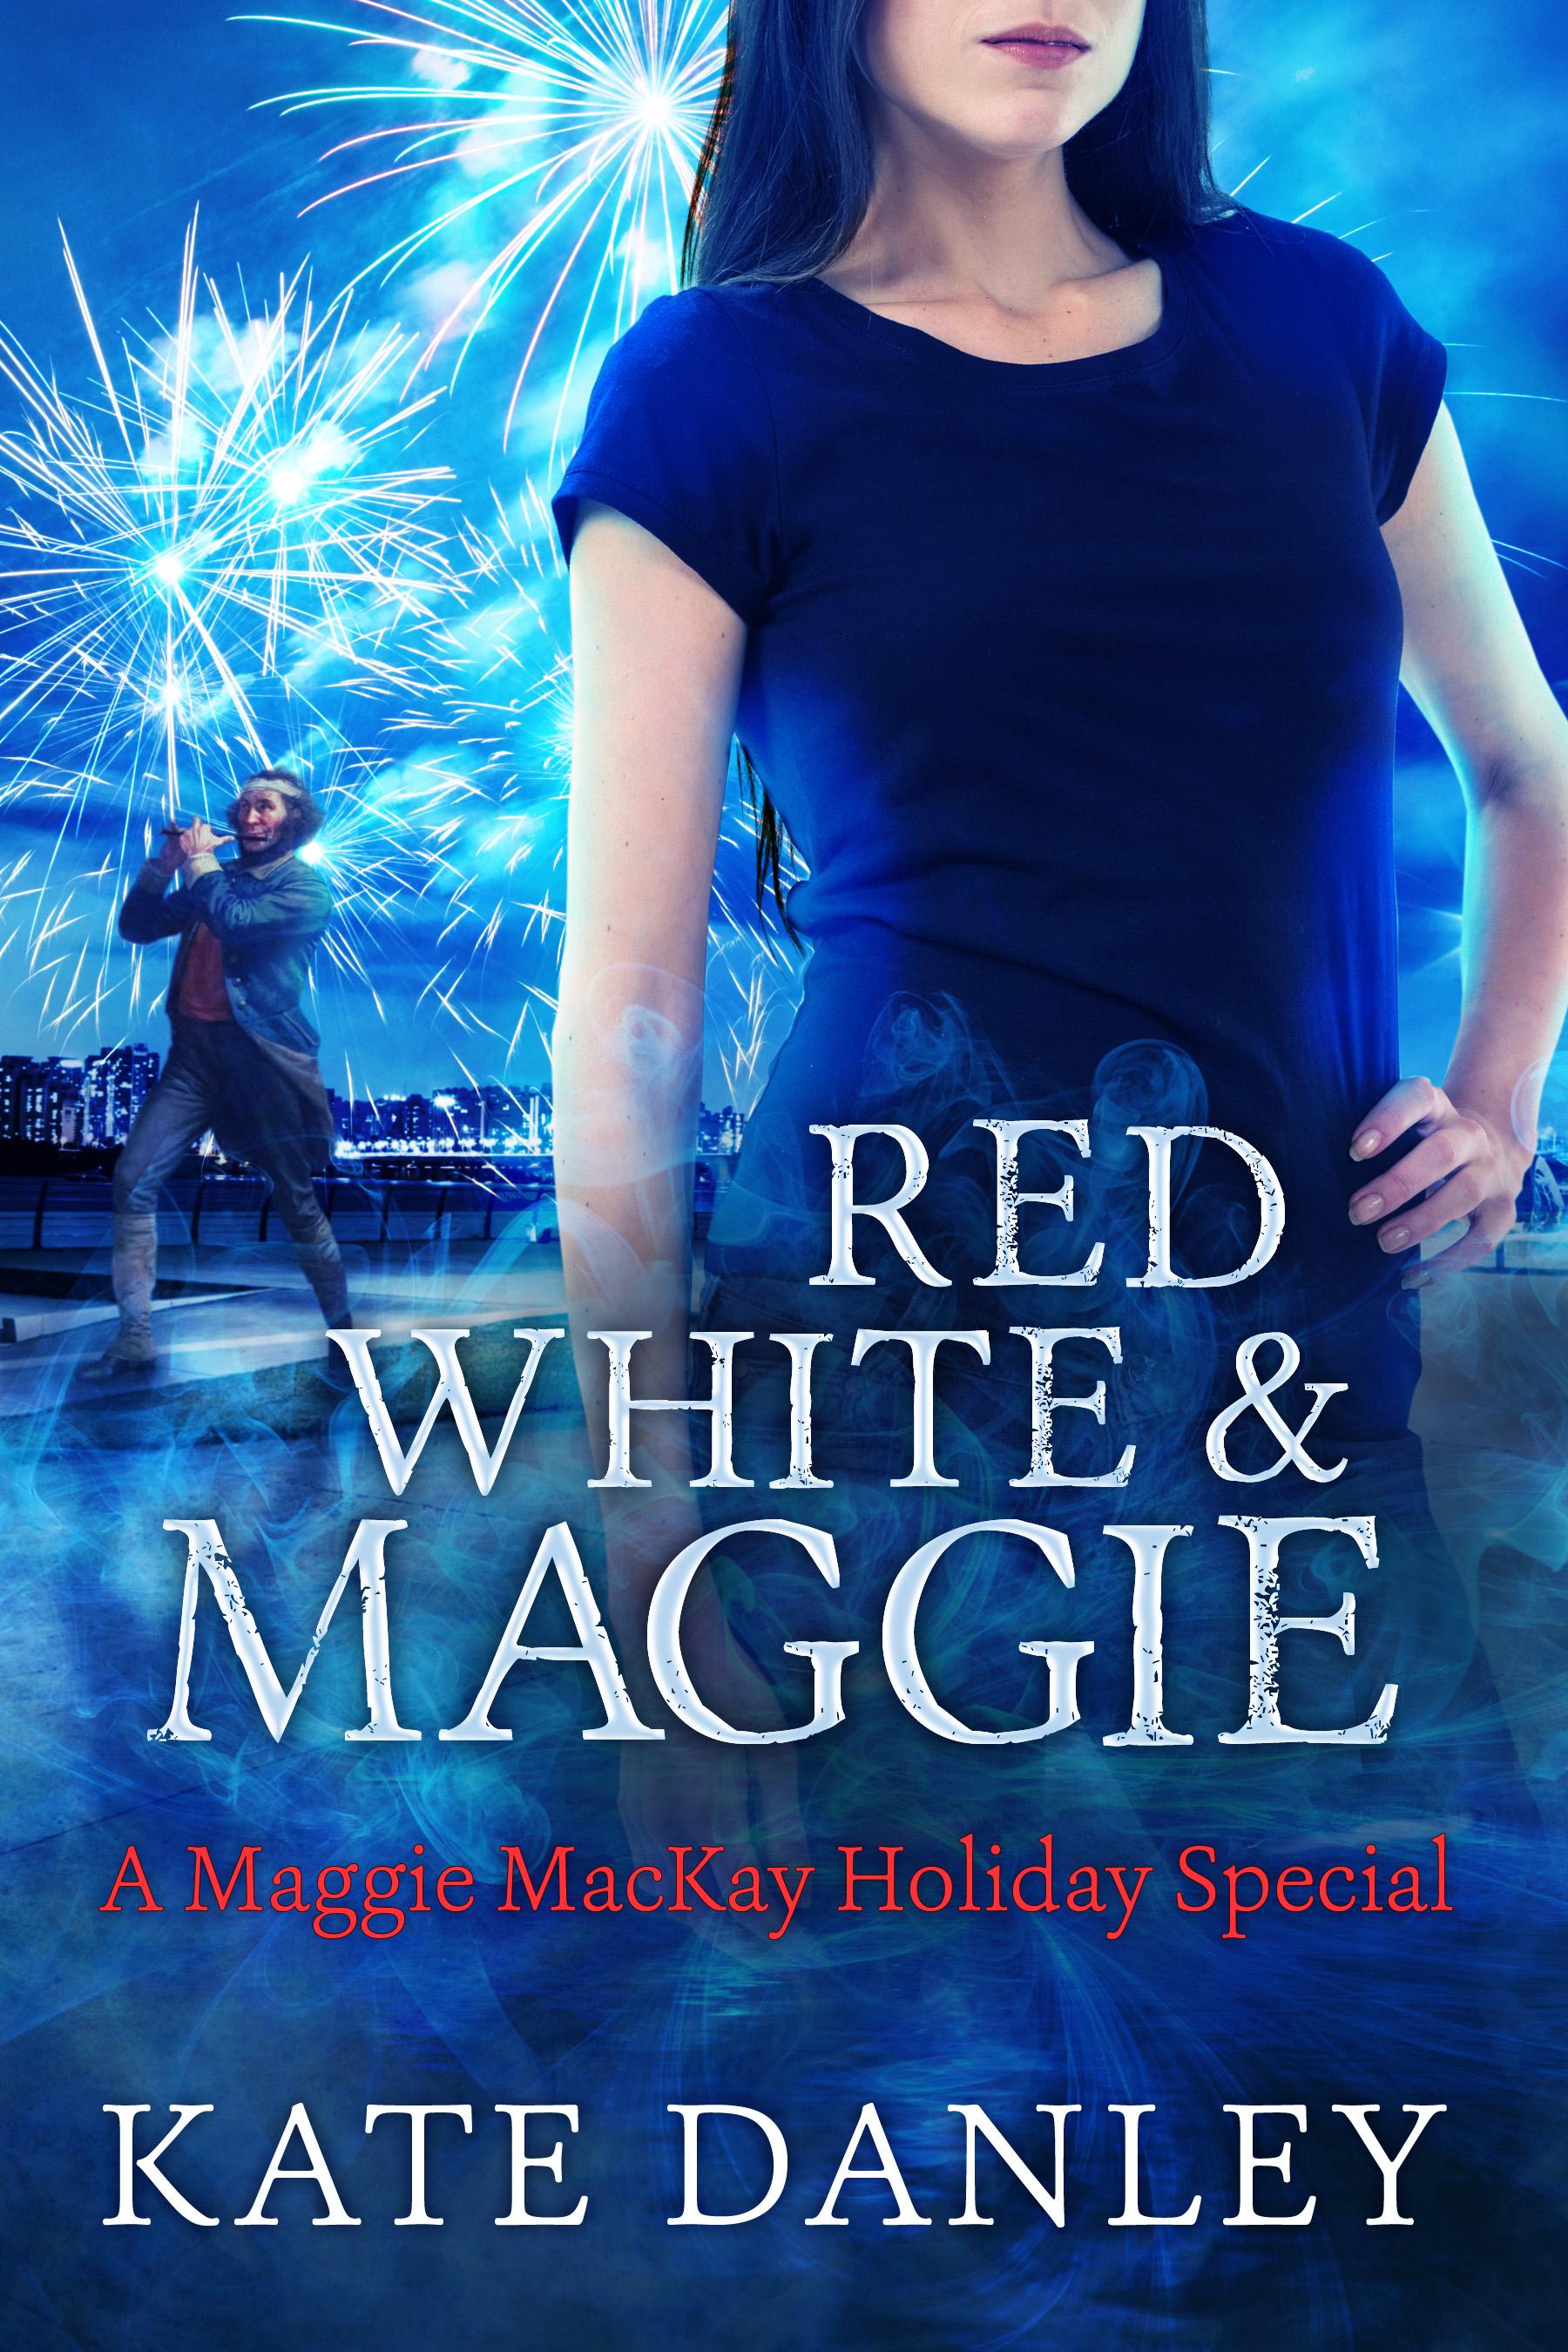 Red White & Maggie_ebook.jpg